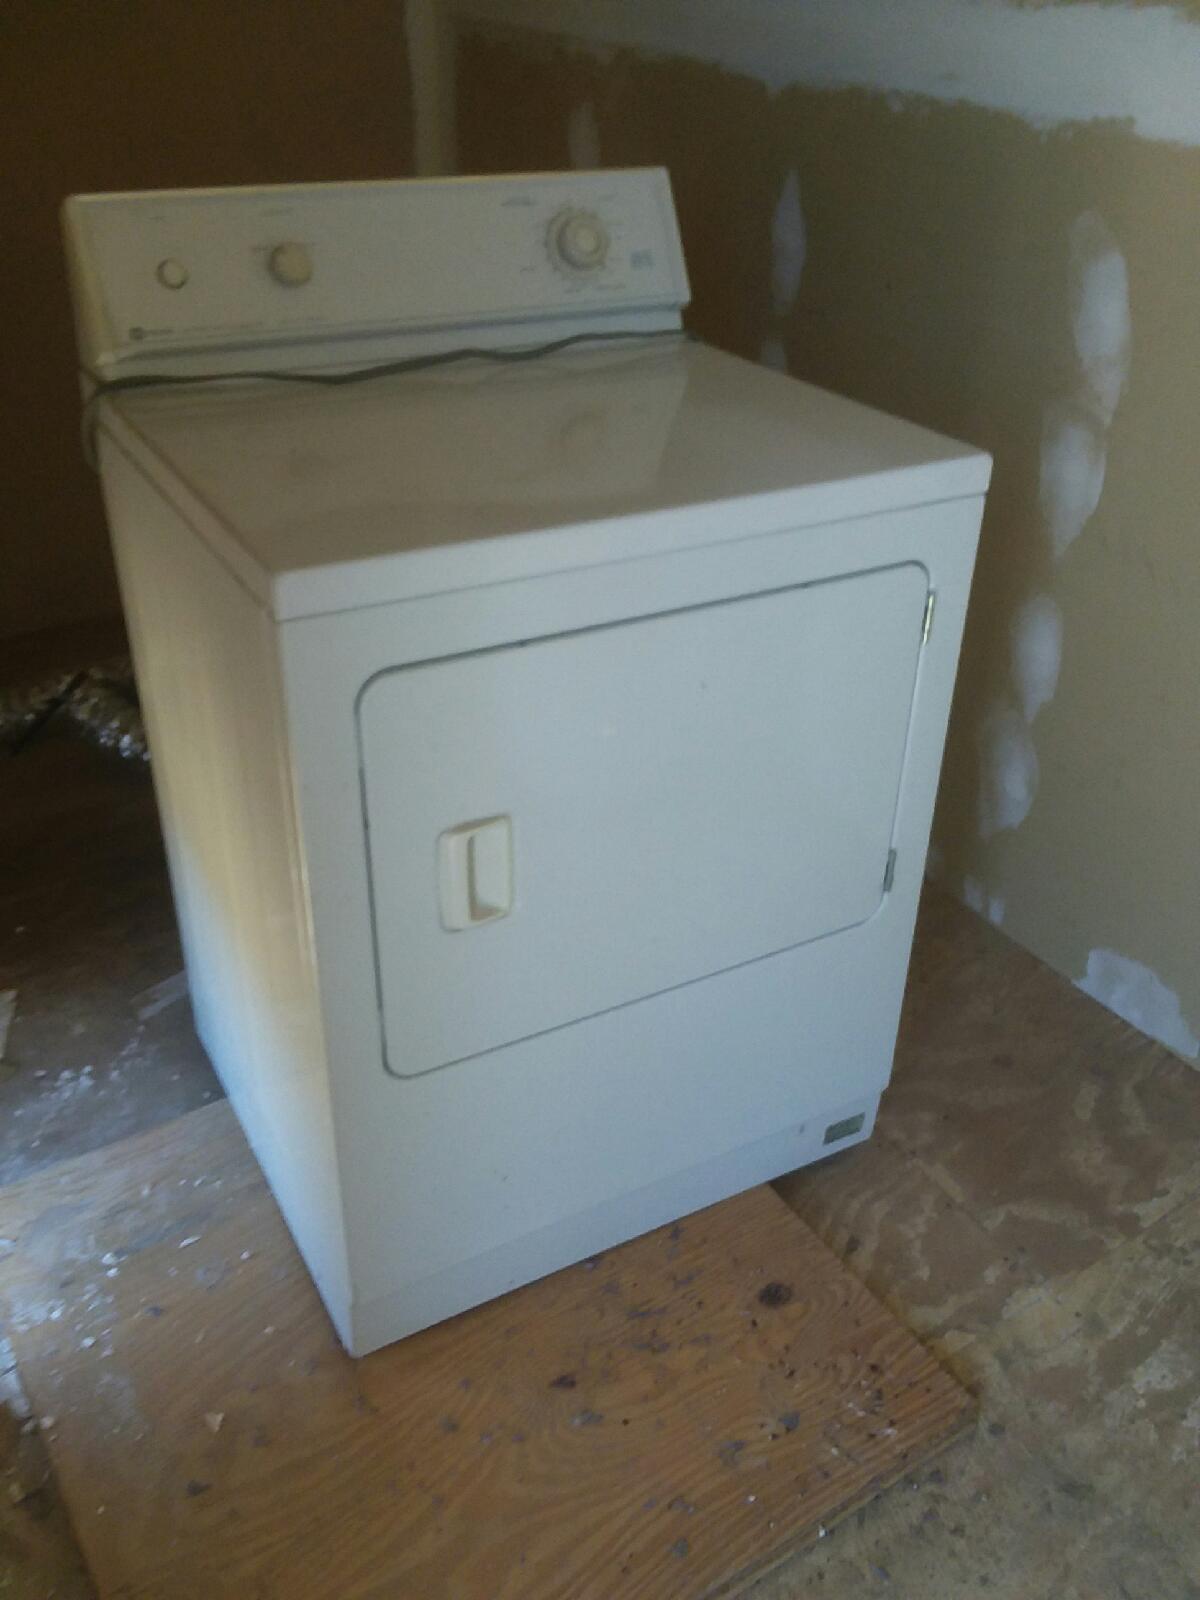 2 used refrigerators, 1 gas dryer, 1 range - $100 each obo call Steve 760 617-1188